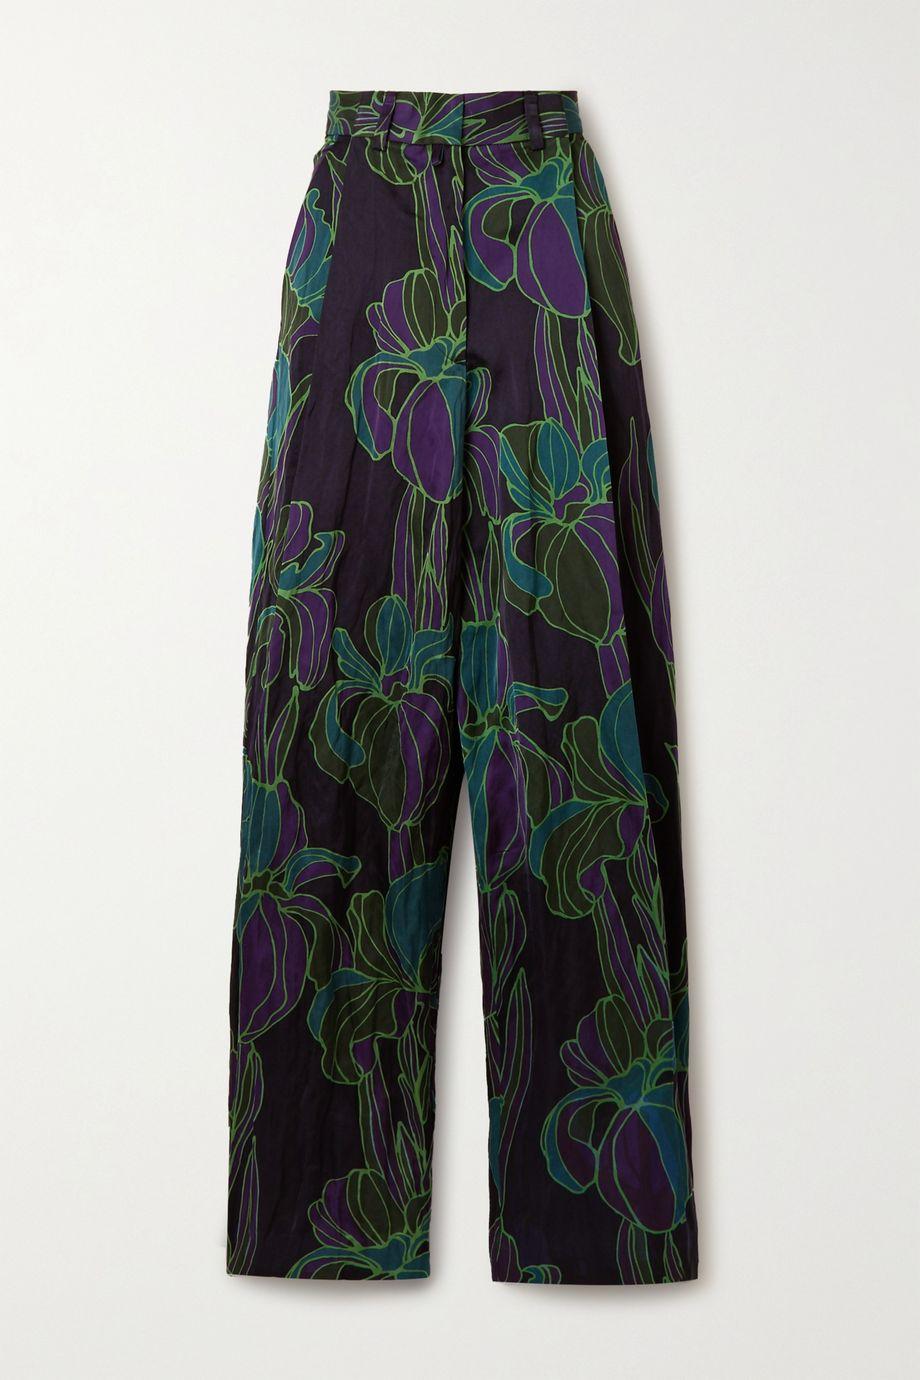 Dries Van Noten Floral-print woven wide-leg pants